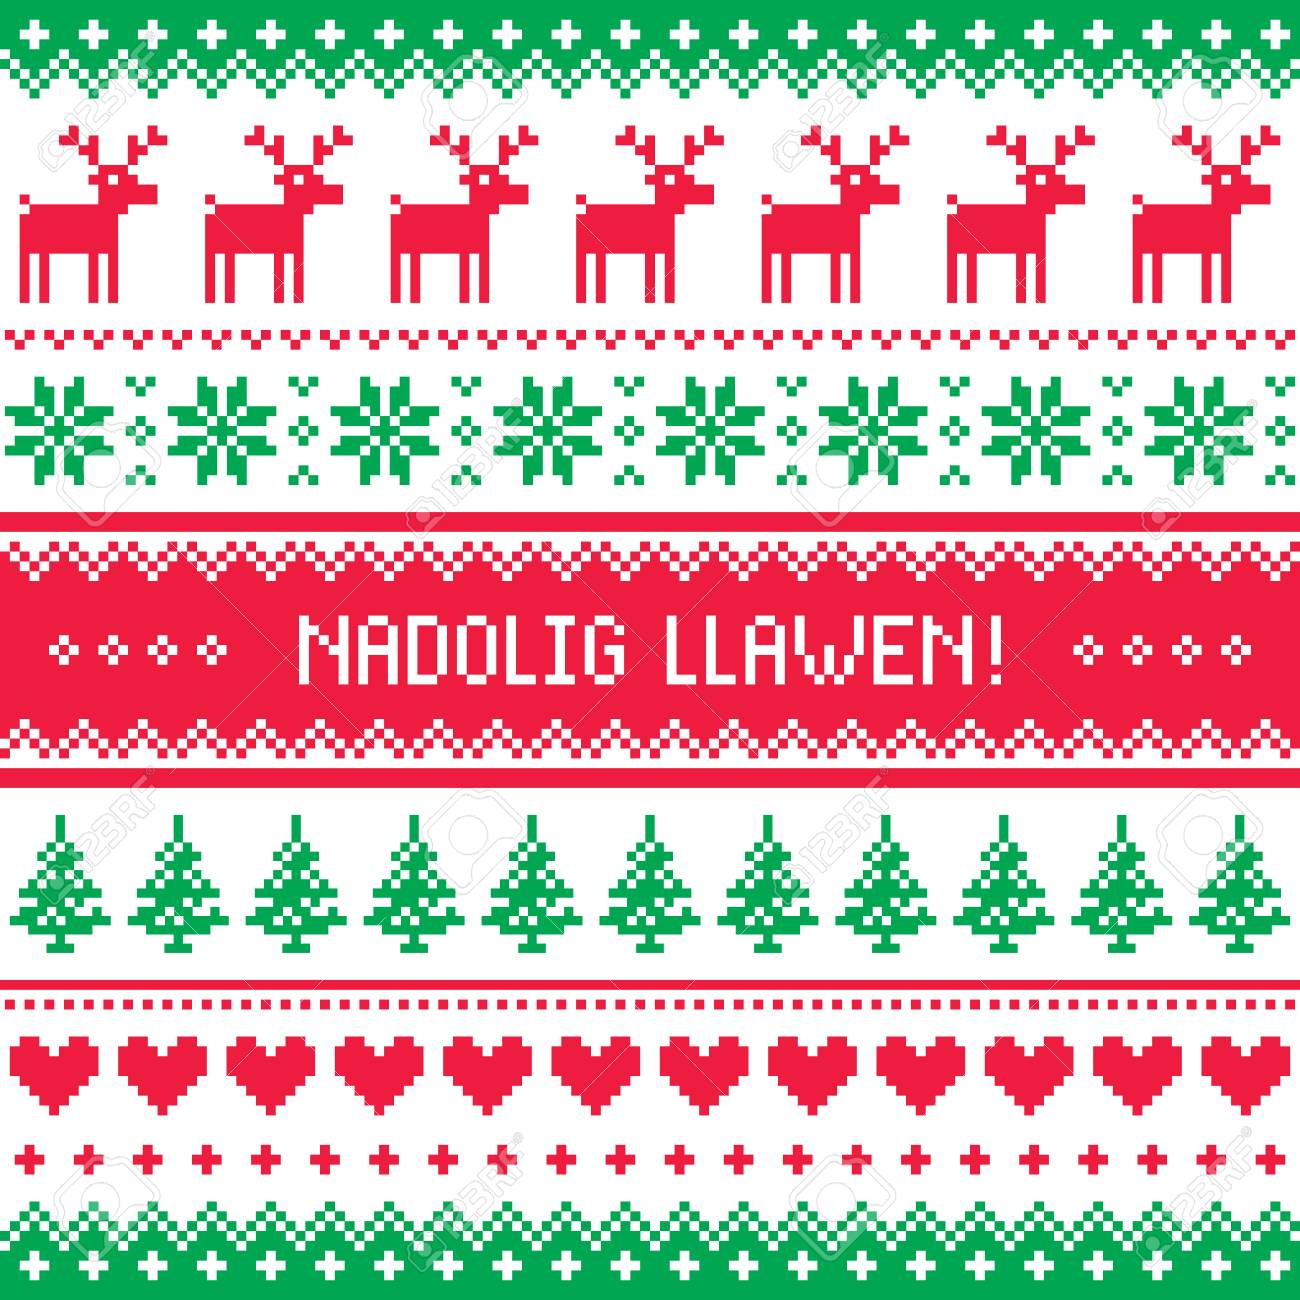 Nadolig llawen merry christmas in welsh greetings card seamless nadolig llawen merry christmas in welsh greetings card seamless pattern stock vector 82050649 m4hsunfo